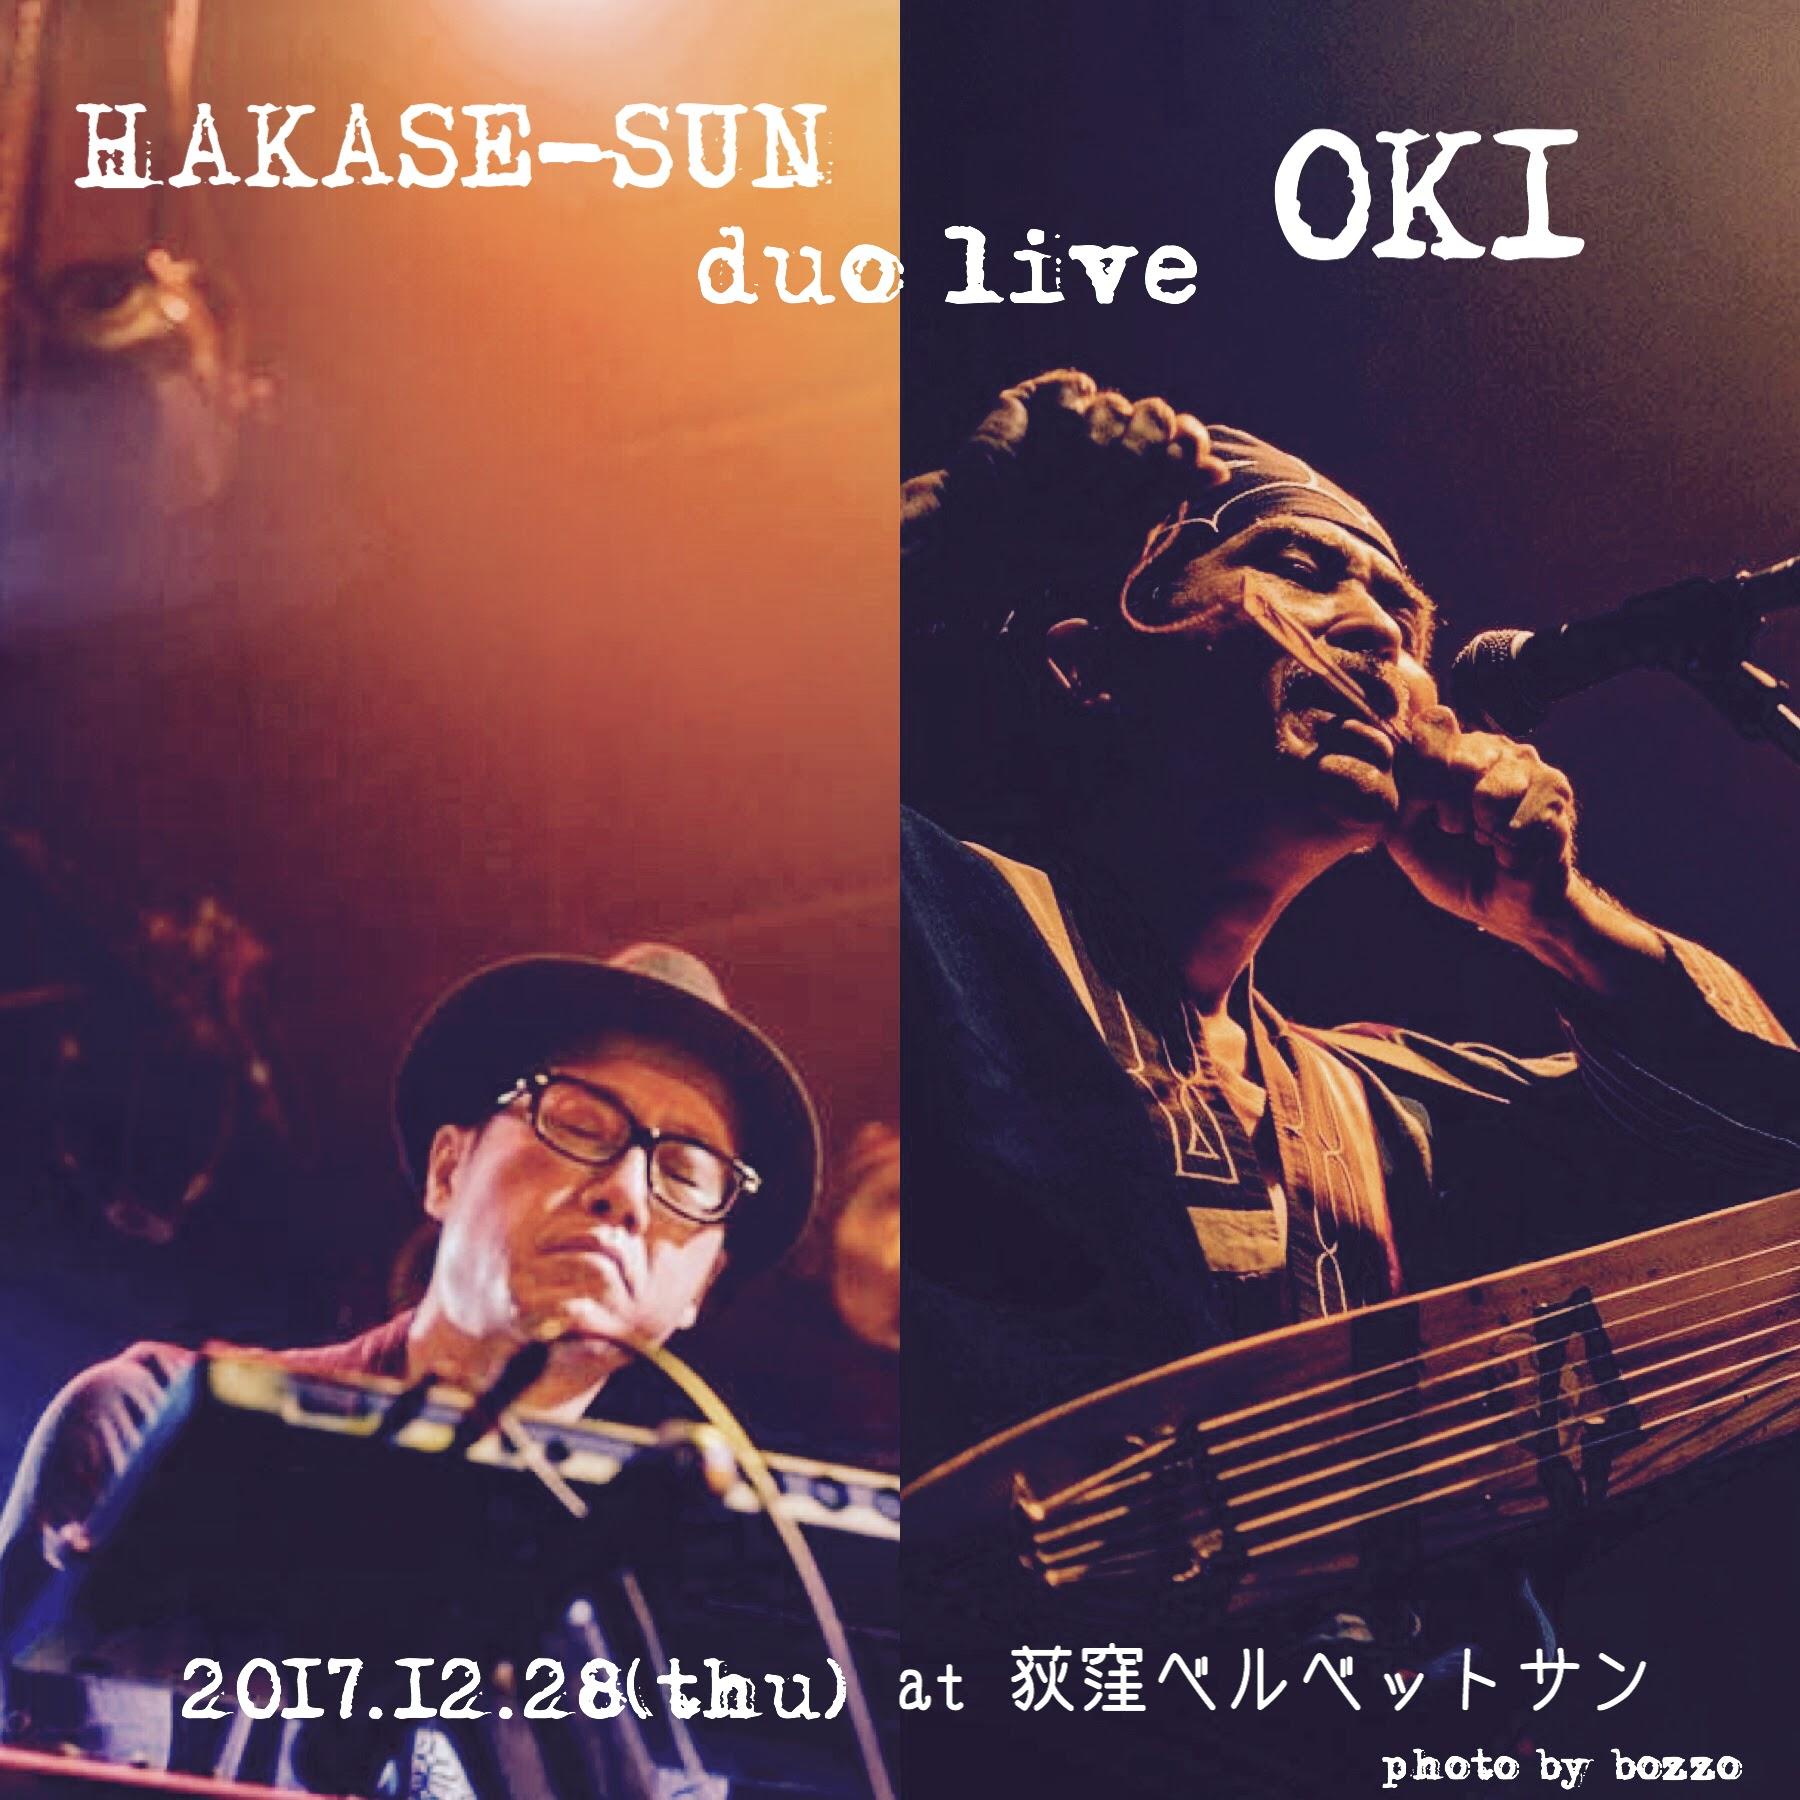 okihakase-sun.JPG